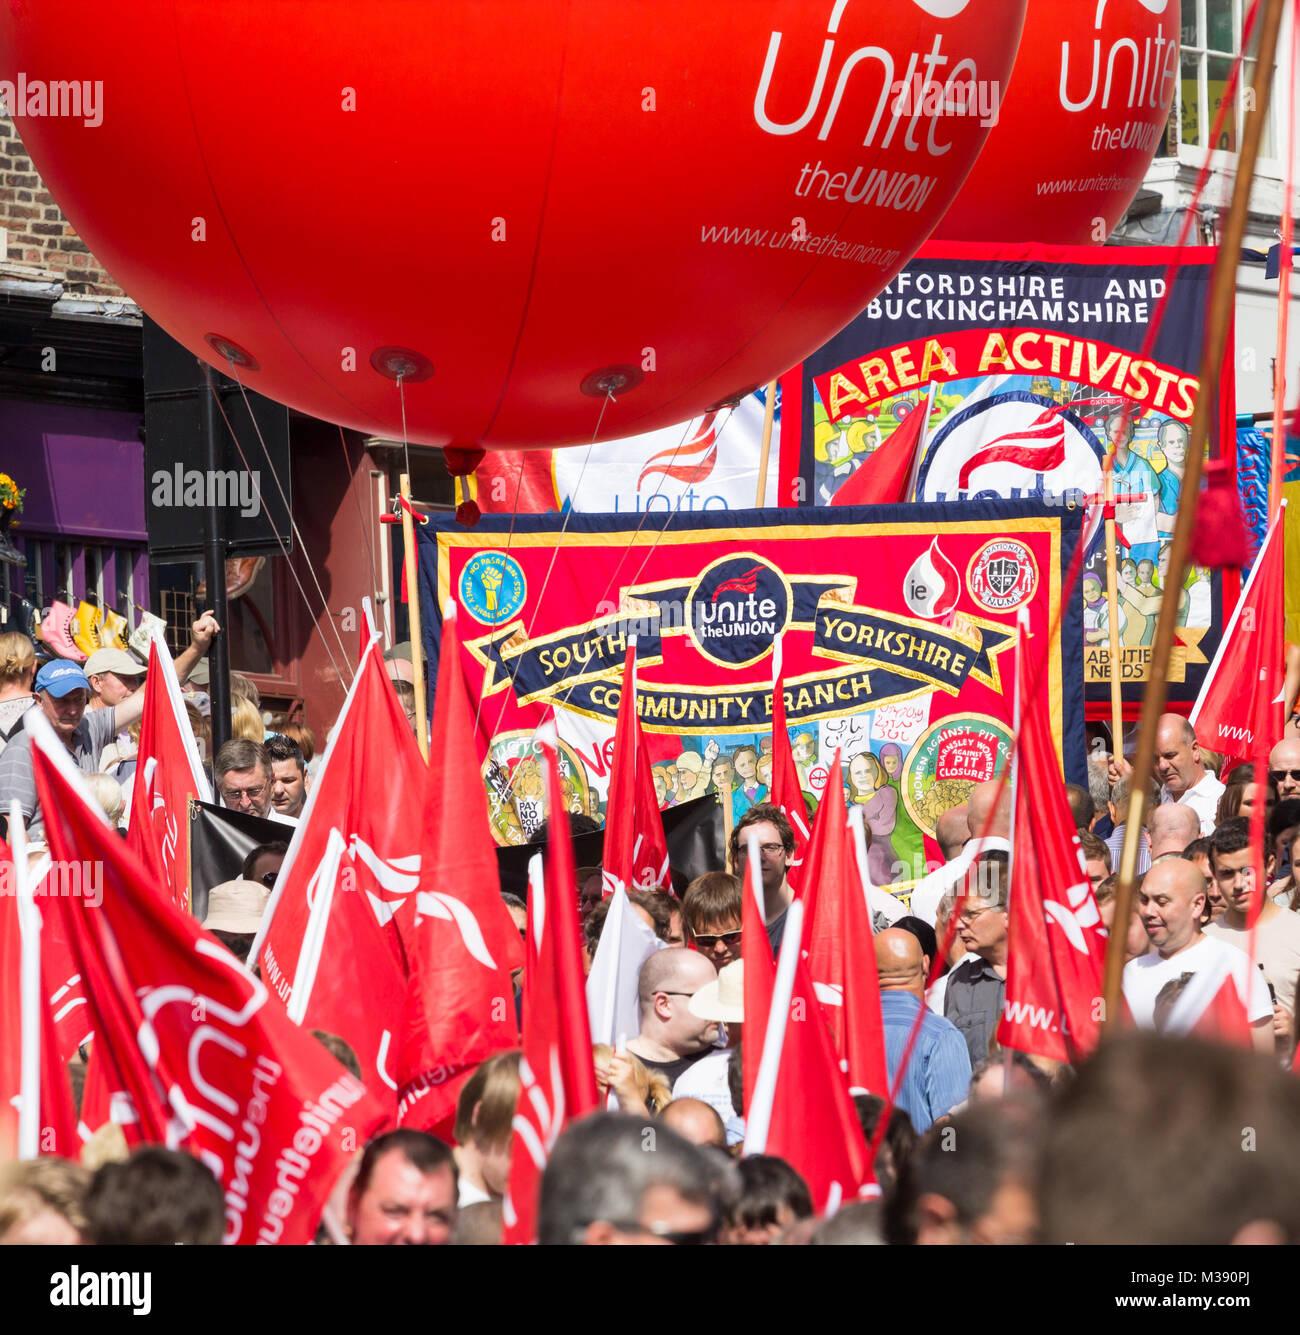 Unite union banners at Durham Miners Gala. Durham, United Kingdom. - Stock Image